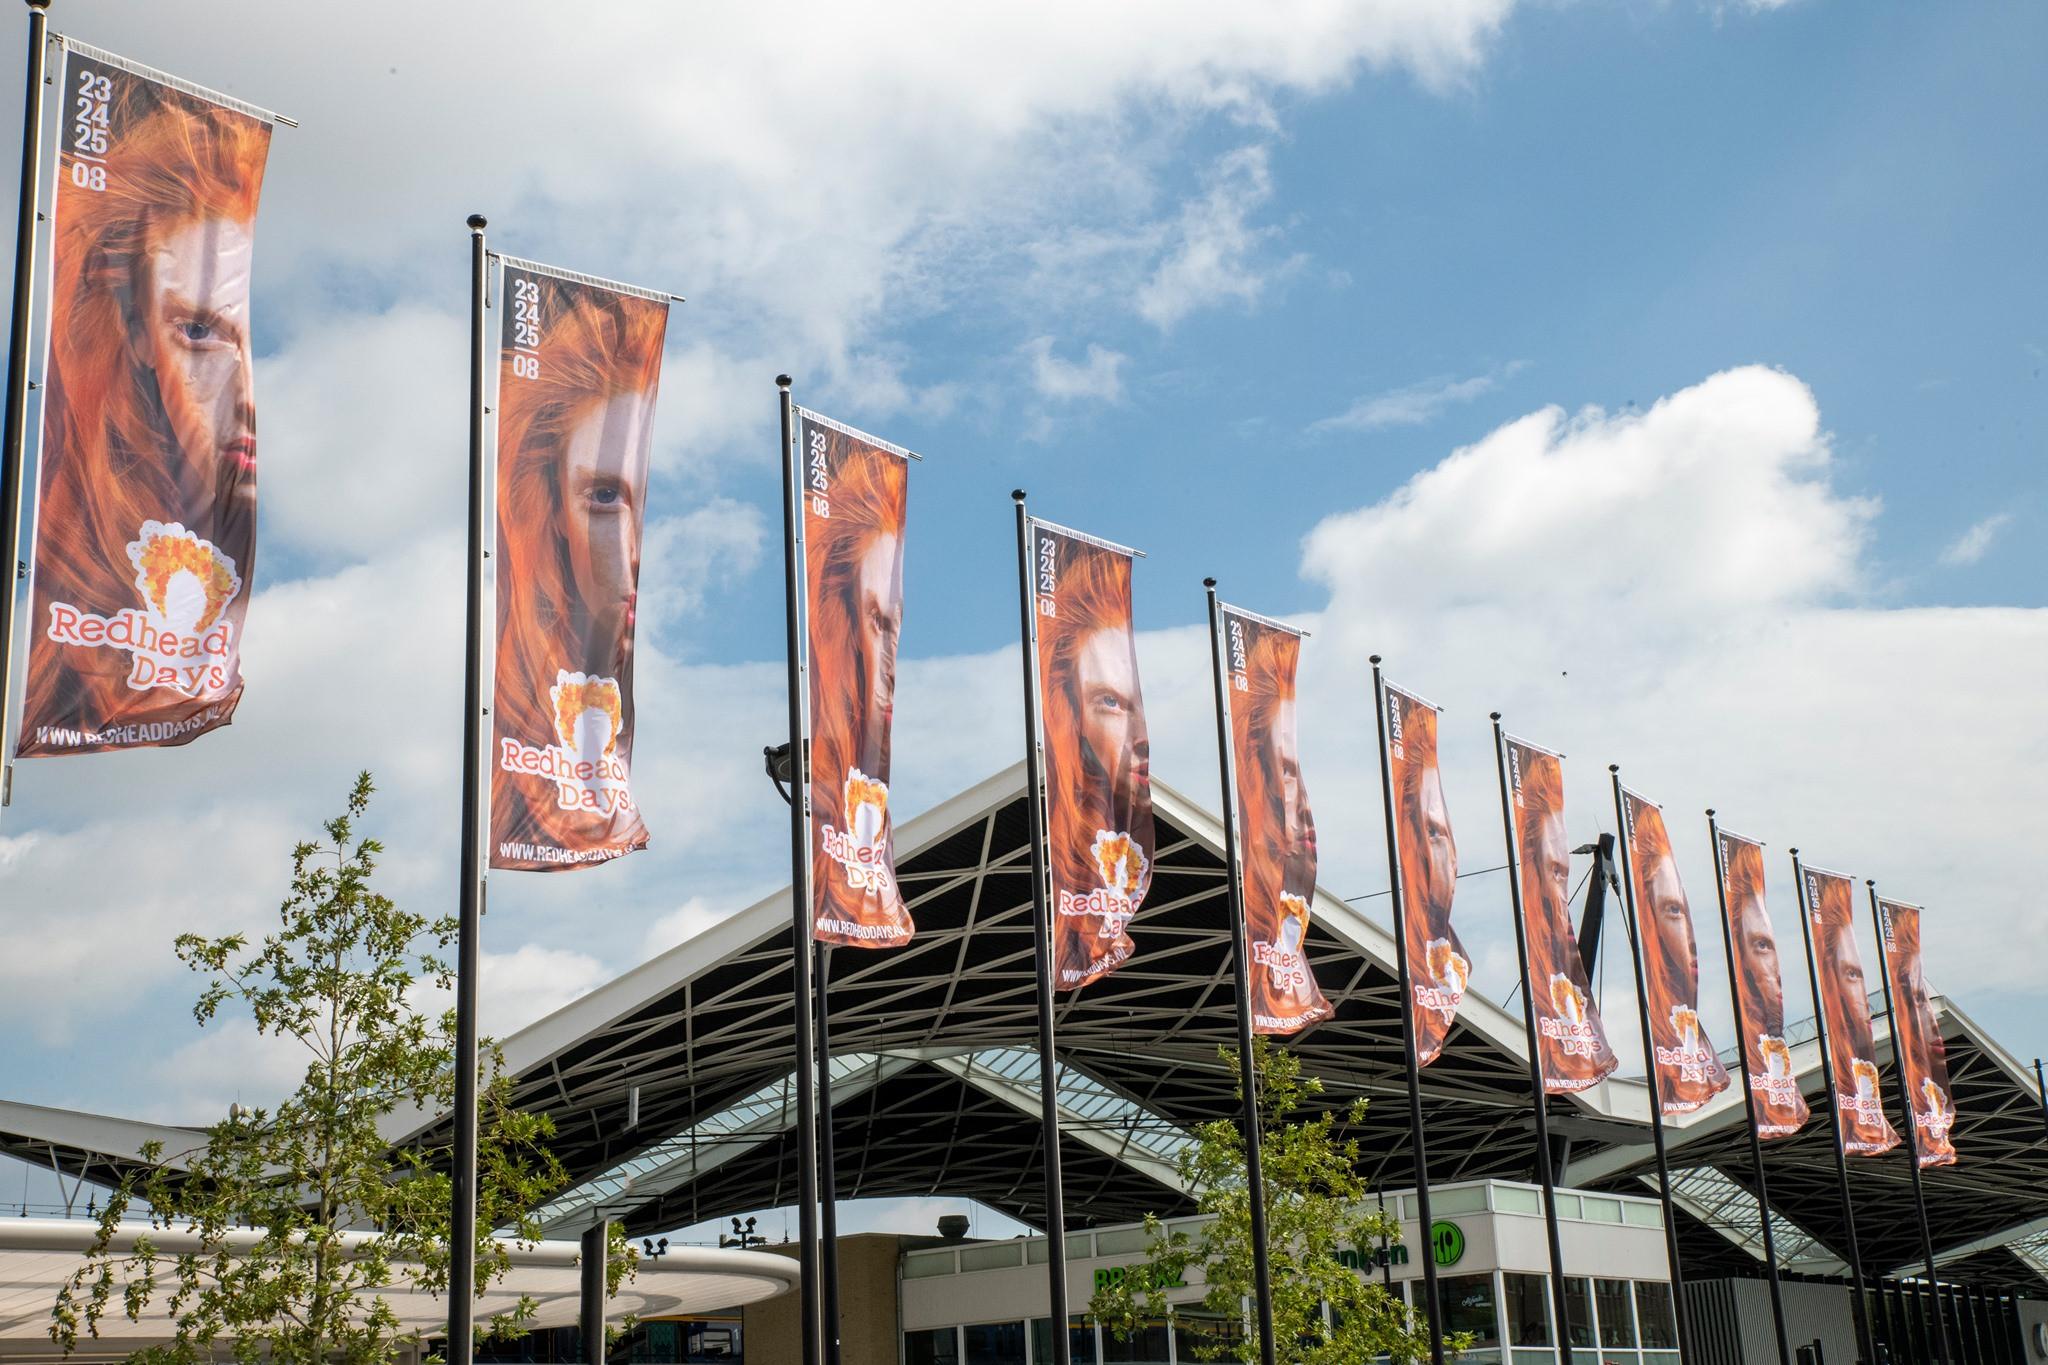 Redhead-Days-banners-Tilburg